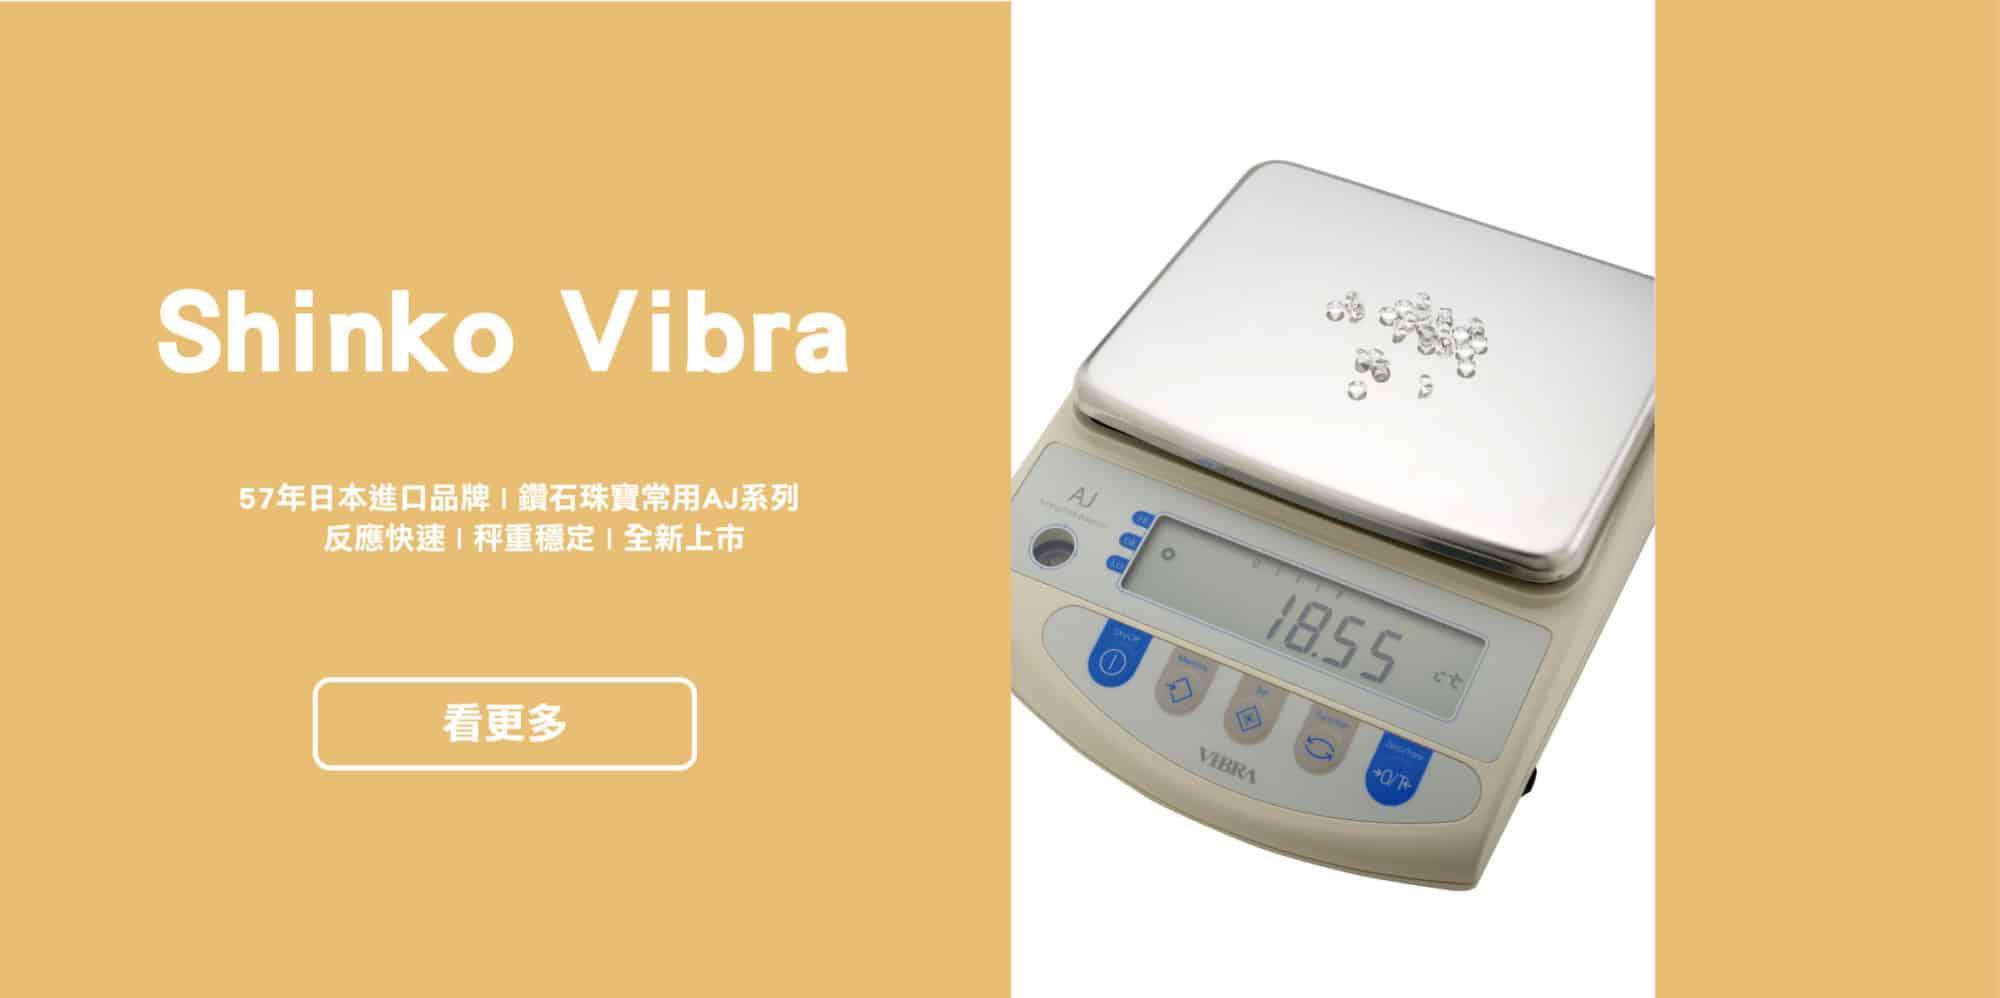 SHINKO VIBRA 日本 新光天秤 精密天平 珠寶秤 鑽石秤 金飾月   沛禮國際 Polit 電子秤專賣